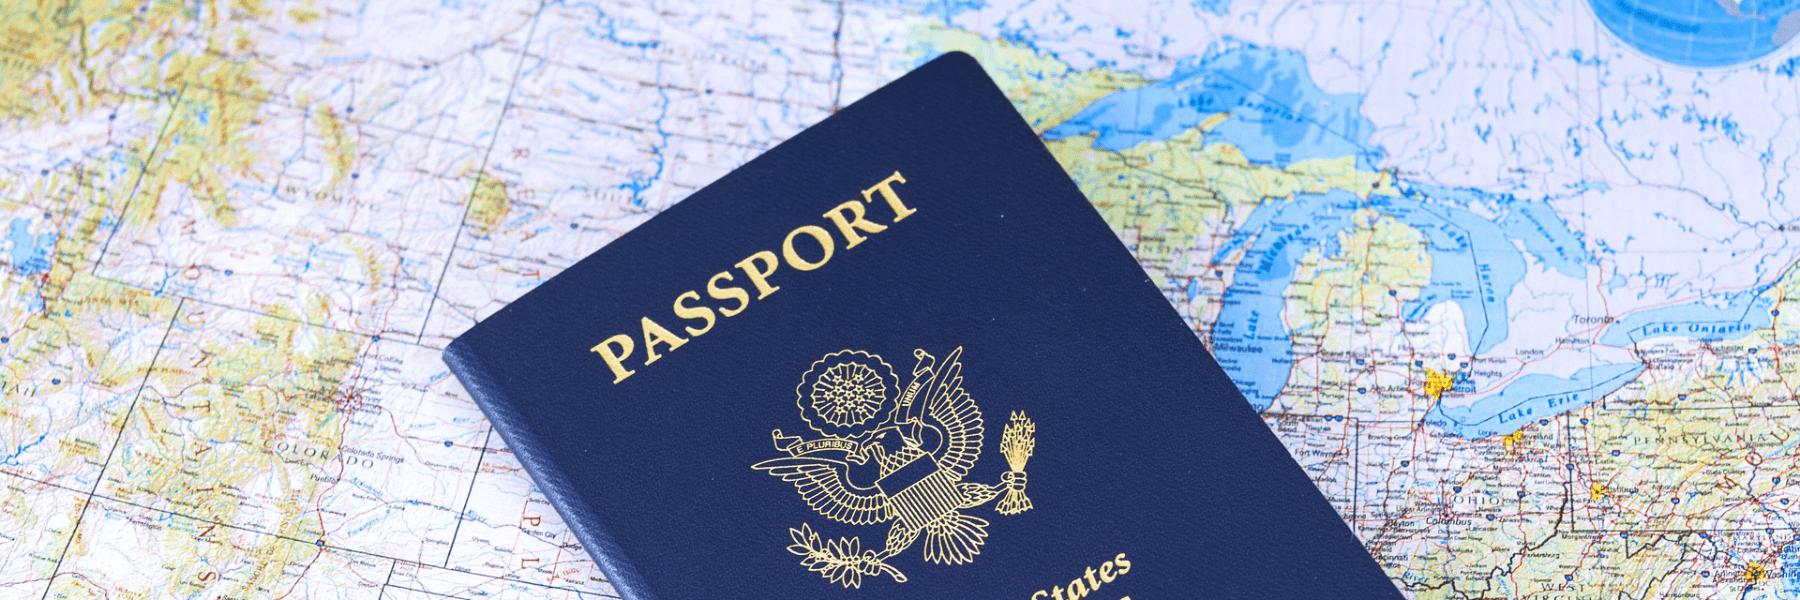 Passport And Documents